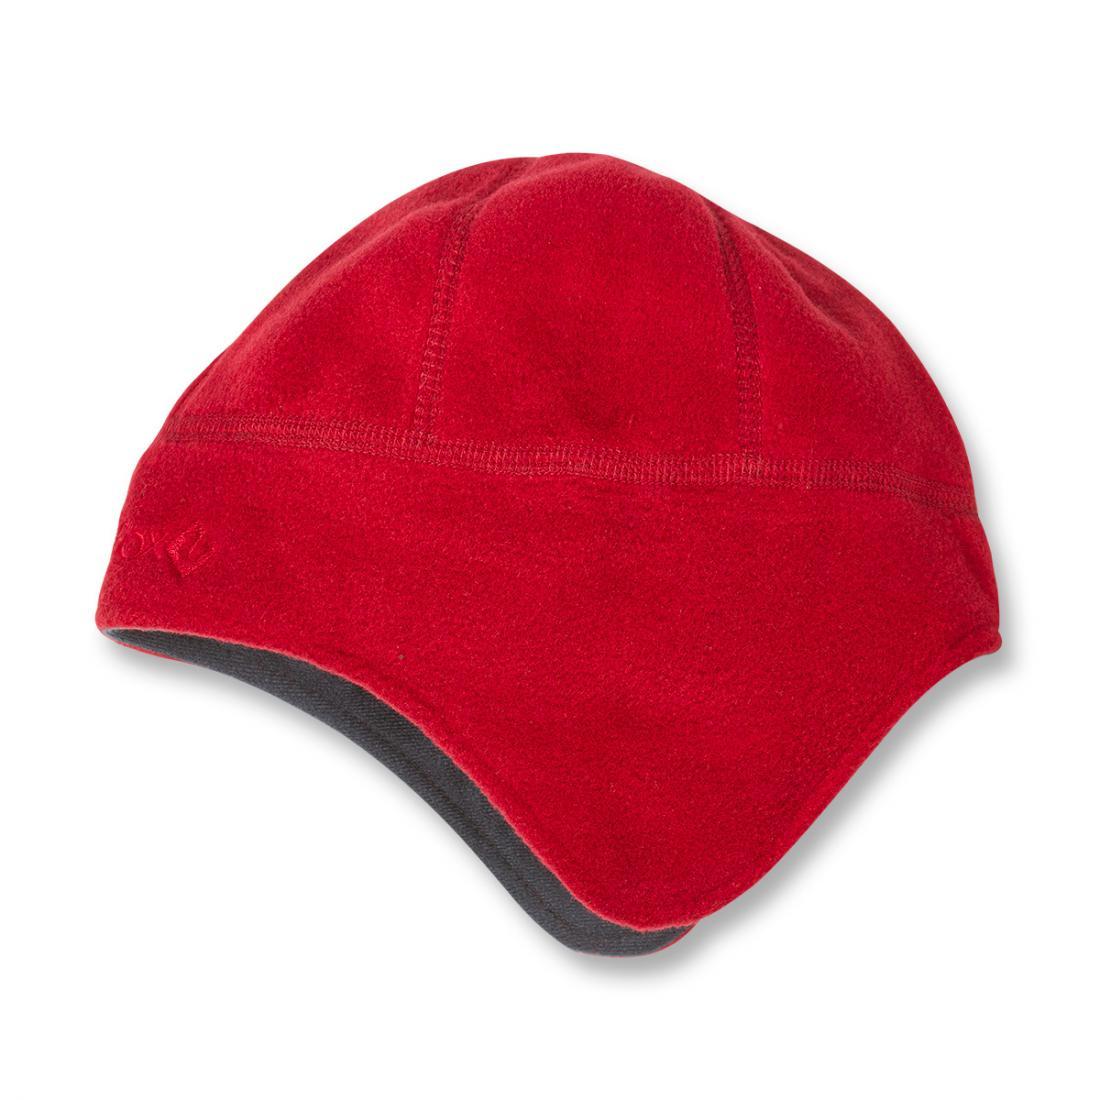 Шапка FiordШапки<br><br><br>Цвет: Красный<br>Размер: 58